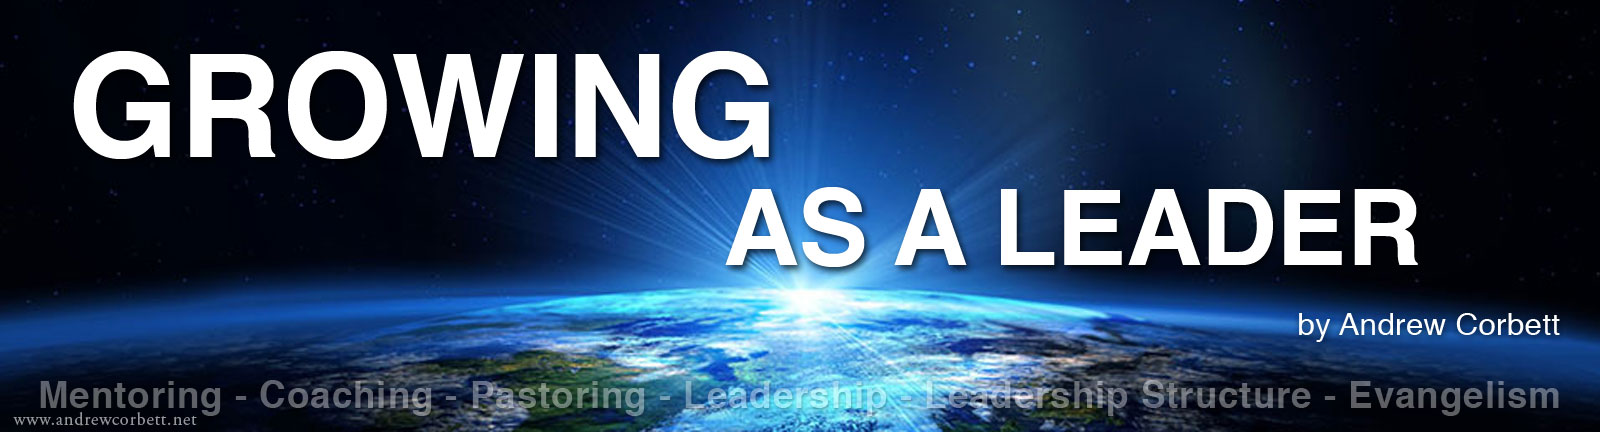 Growing As A Leader - Church-Based Leadership Development